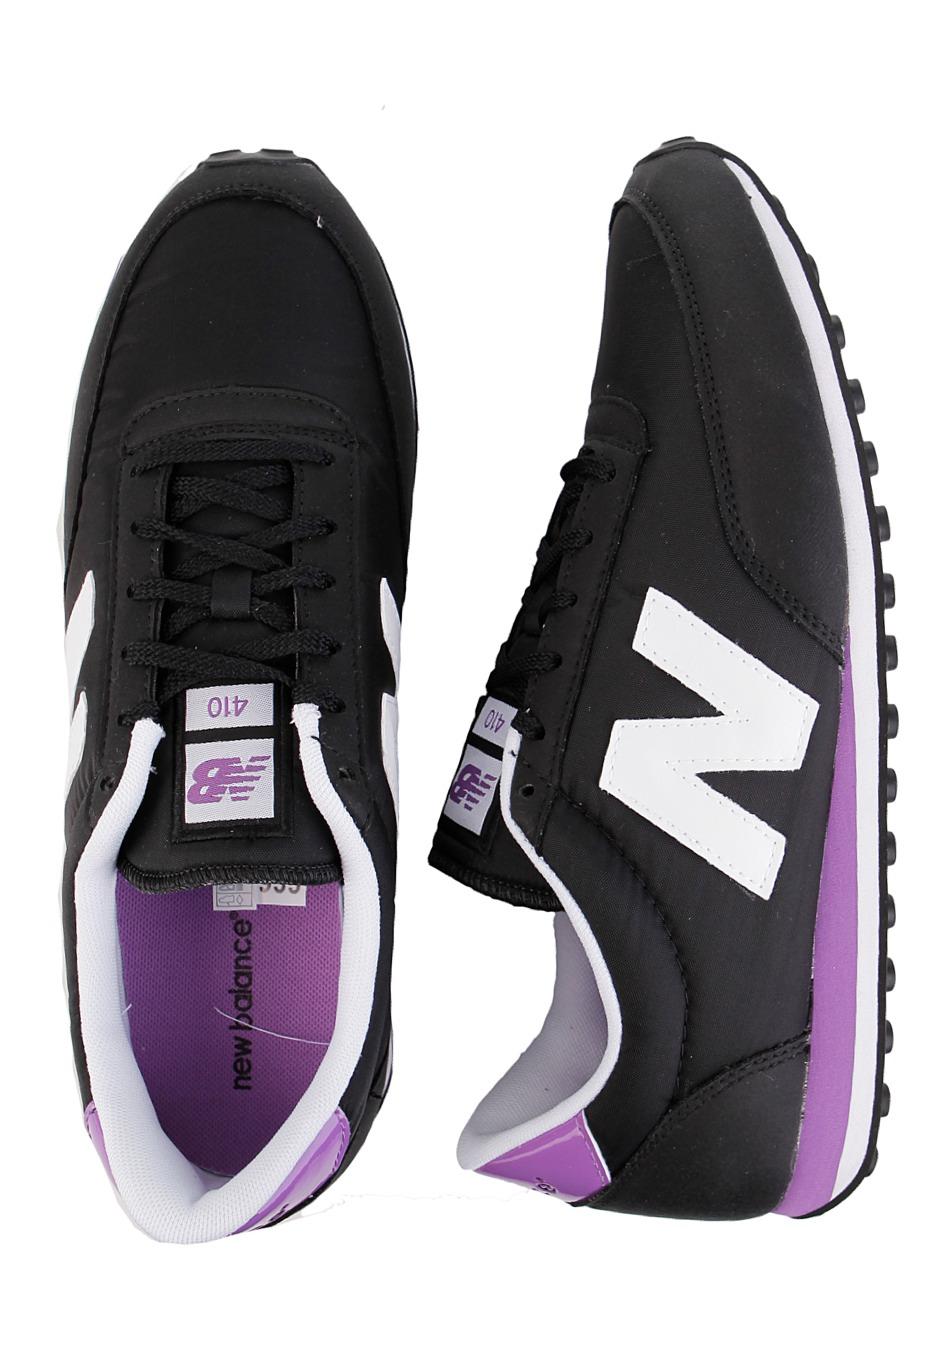 new balance u410 violet